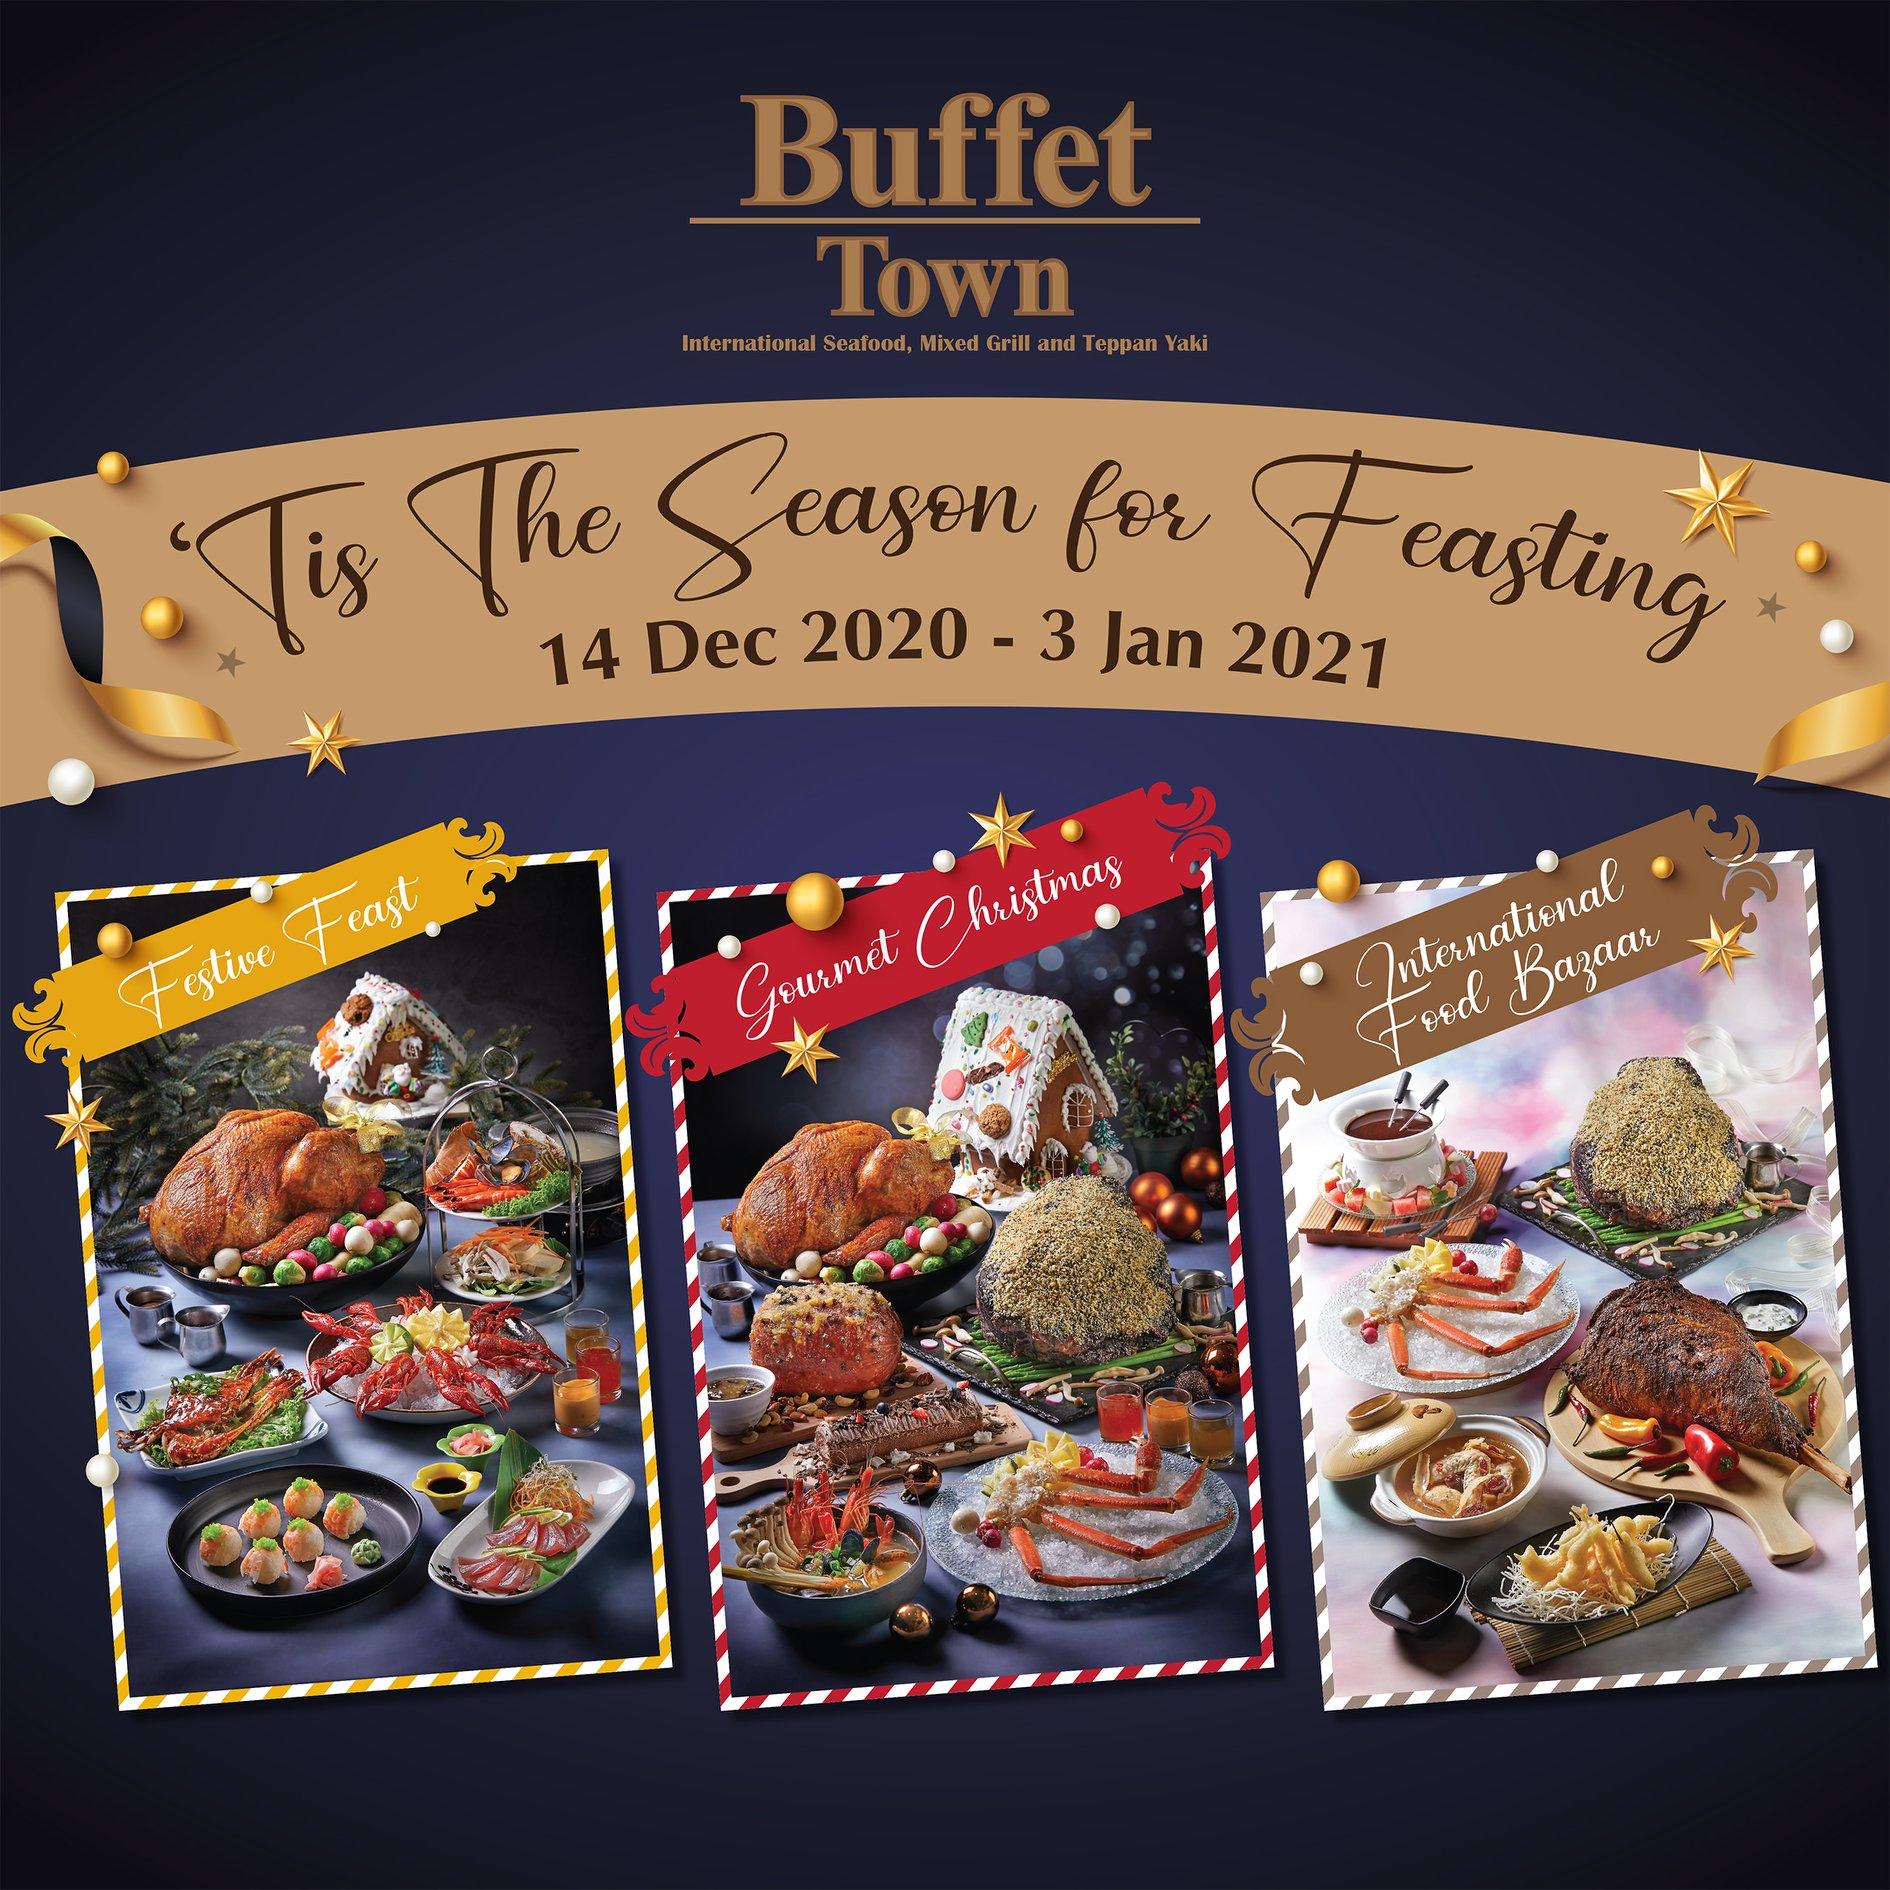 Buffet town halal-certified